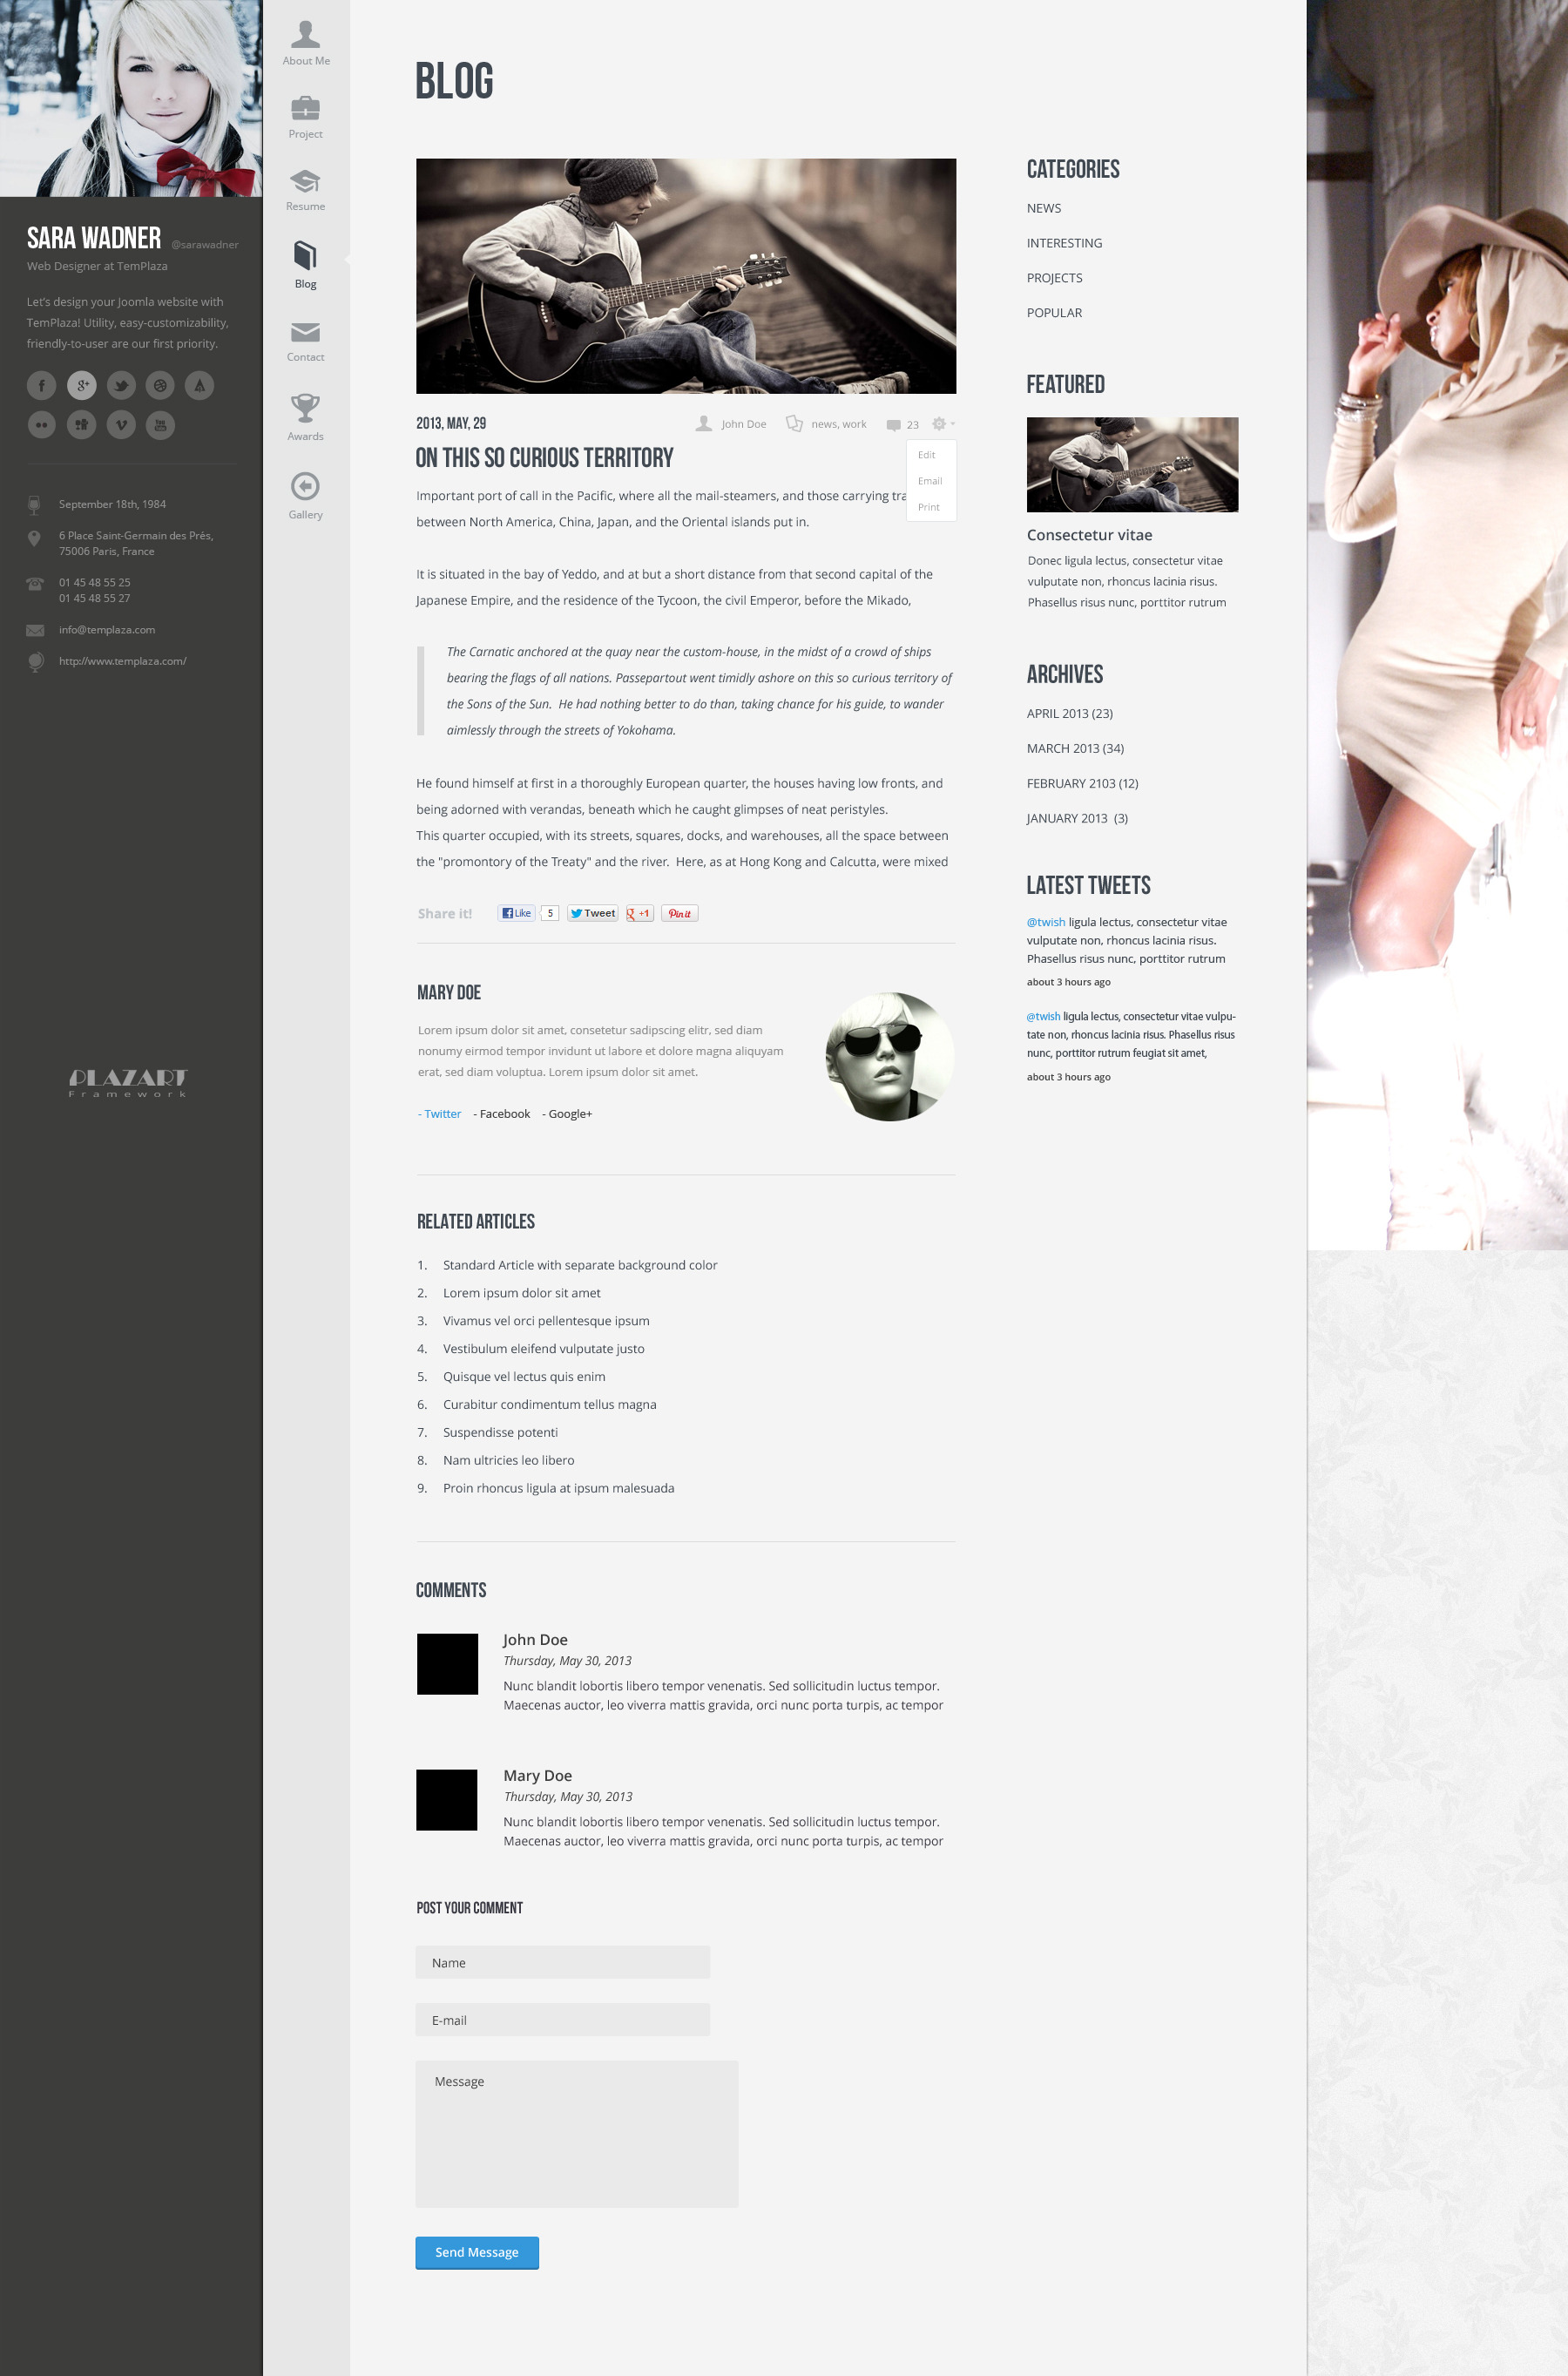 resume fixer resume fixer karina m tk - Resume Fixer